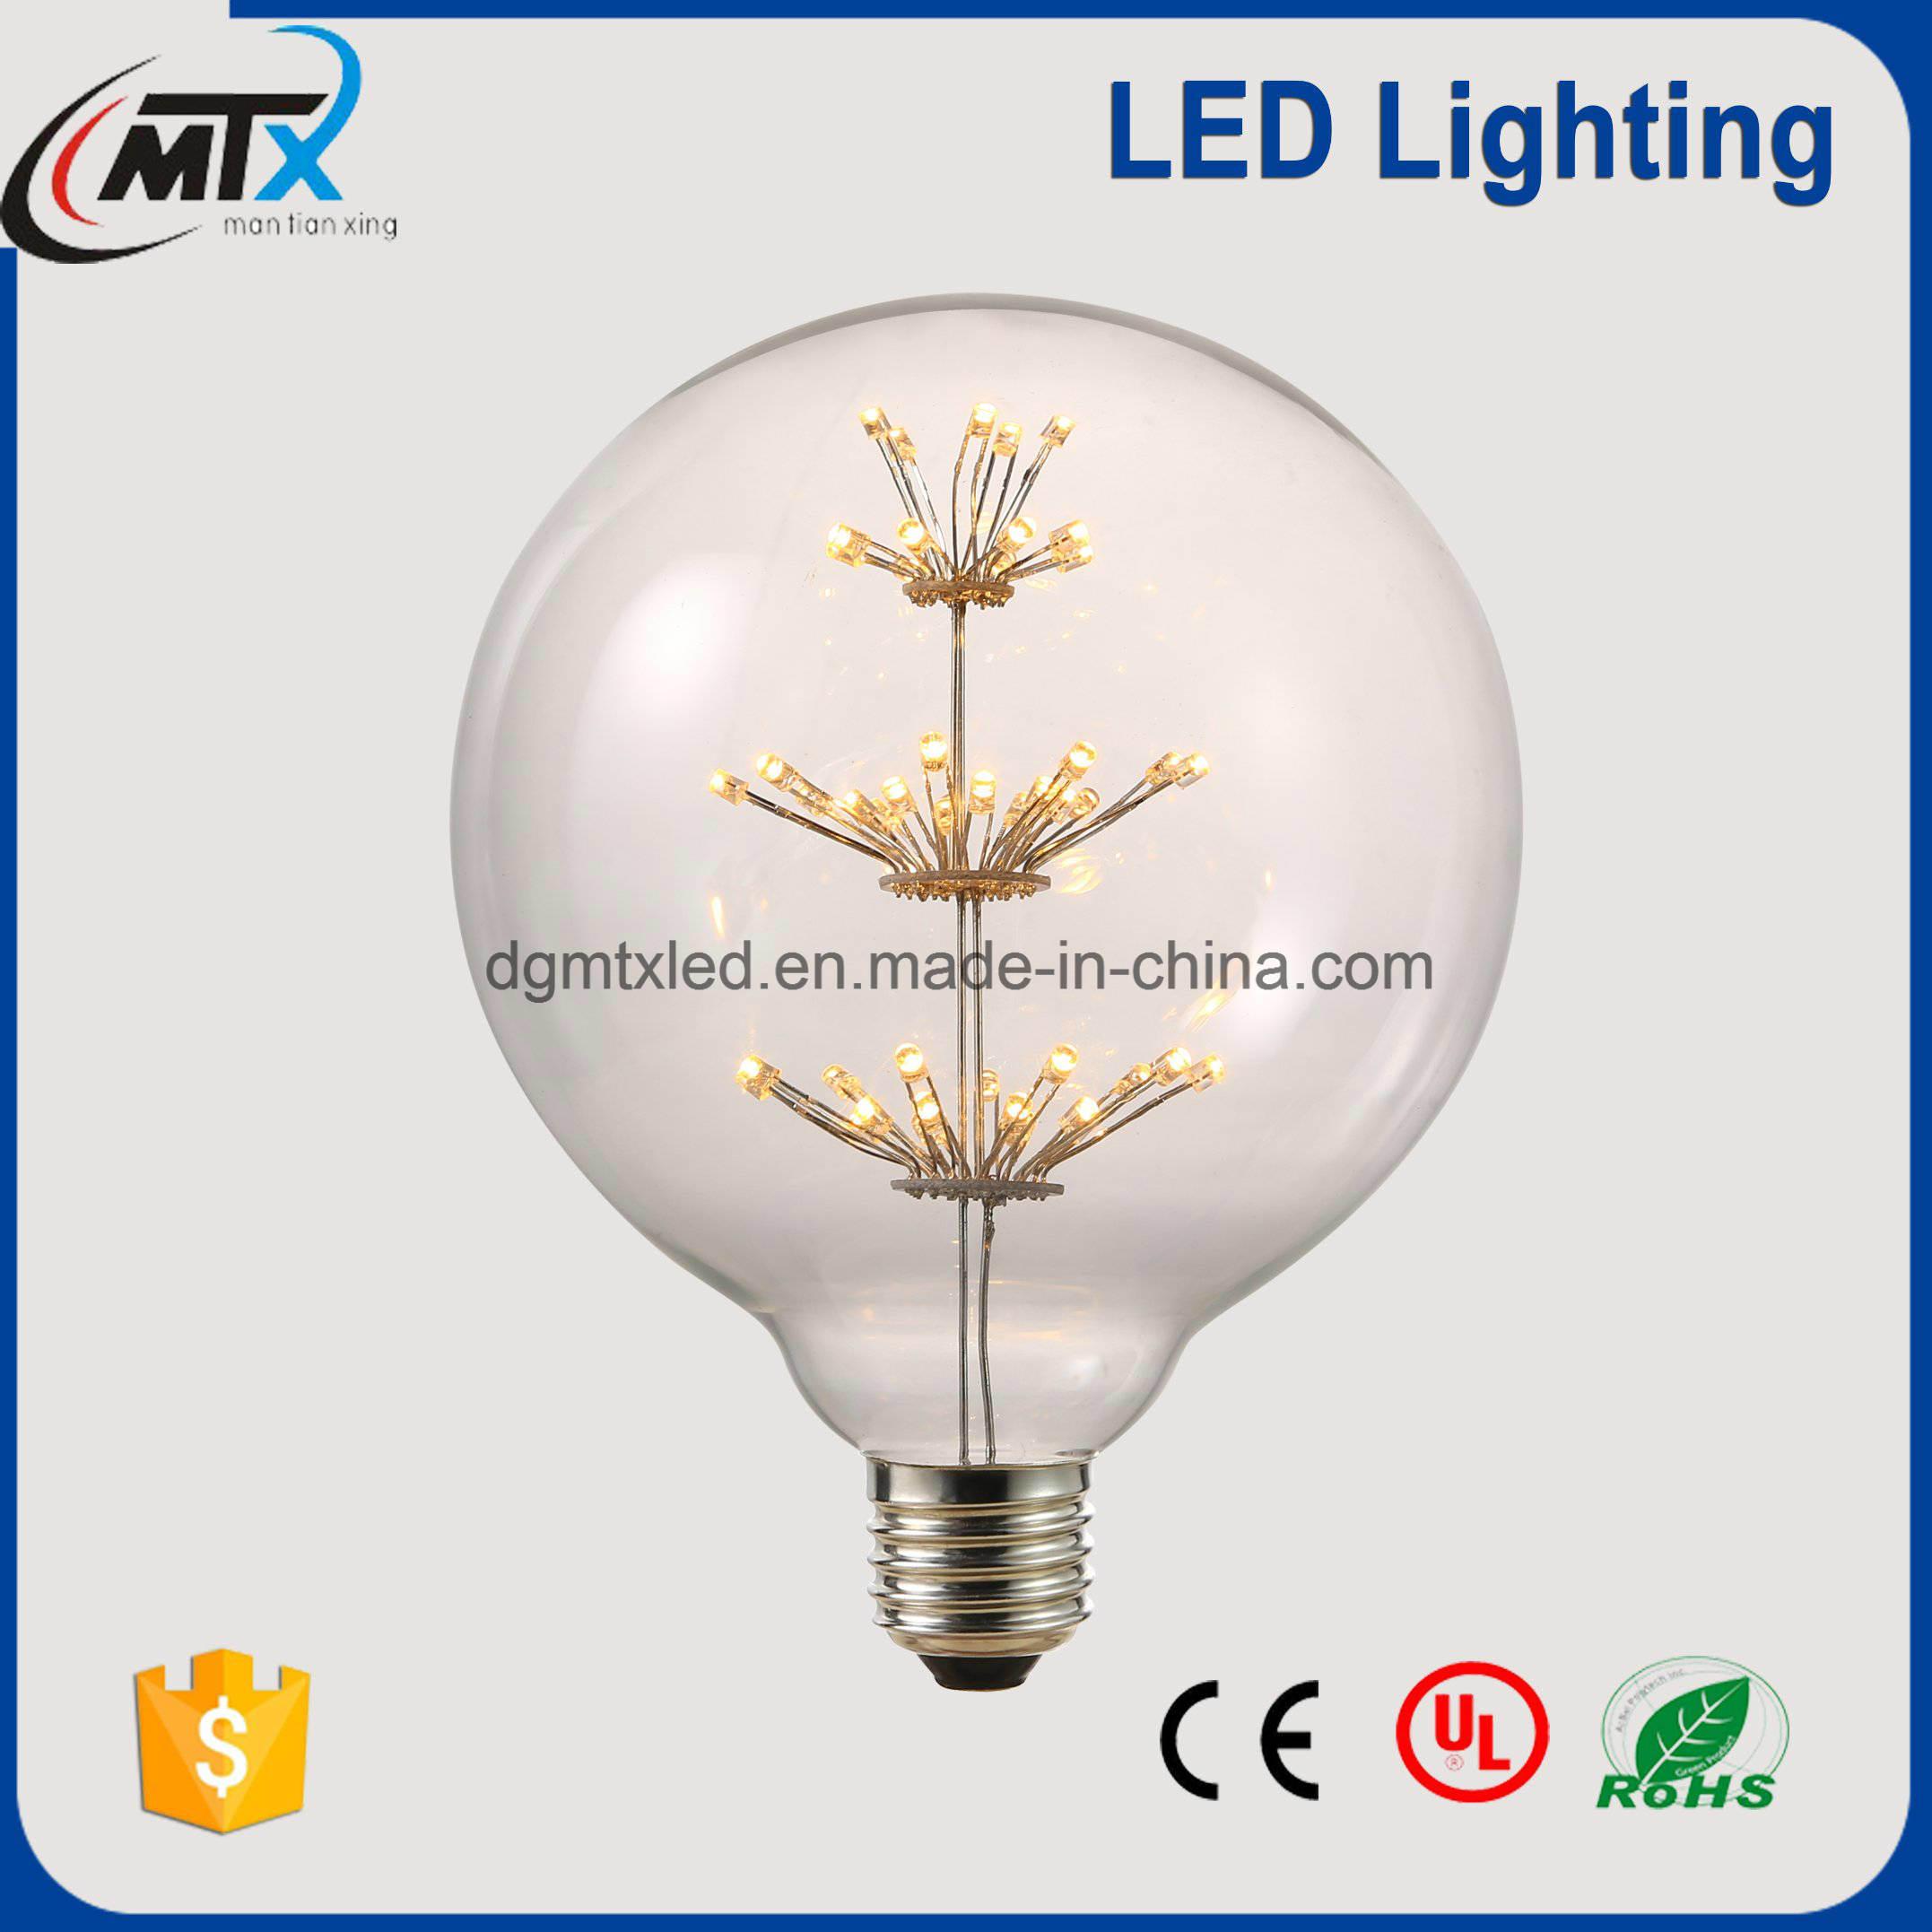 2700k-6500K E22/26/27 LED pixel string lights, LED bulb e27 light bulb